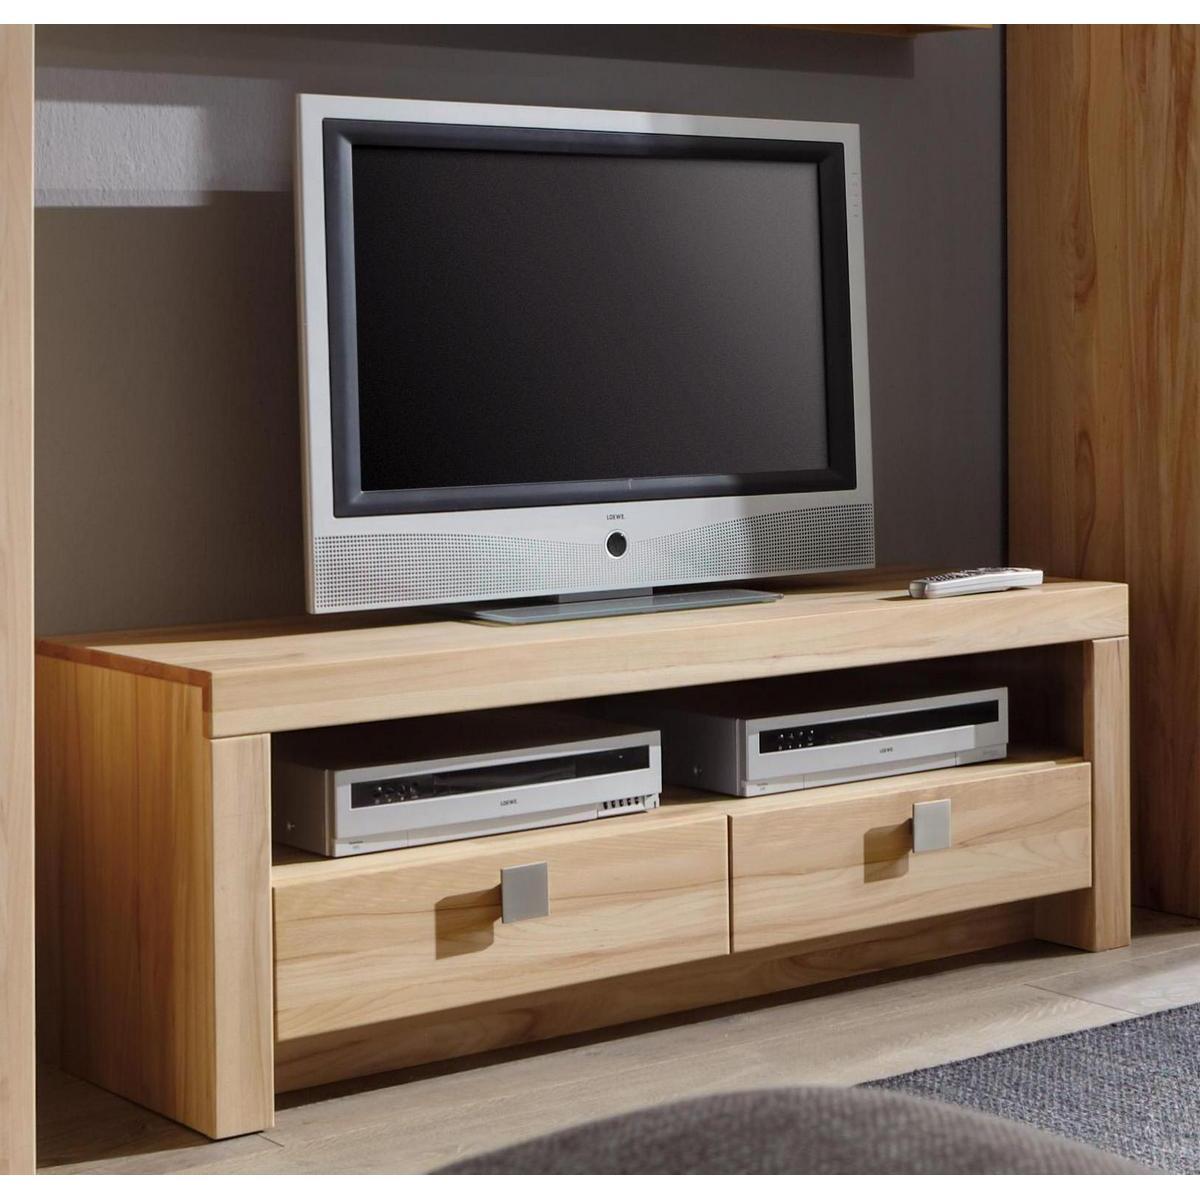 massivholz wohnwand messina kernbuche massiv ge lt. Black Bedroom Furniture Sets. Home Design Ideas